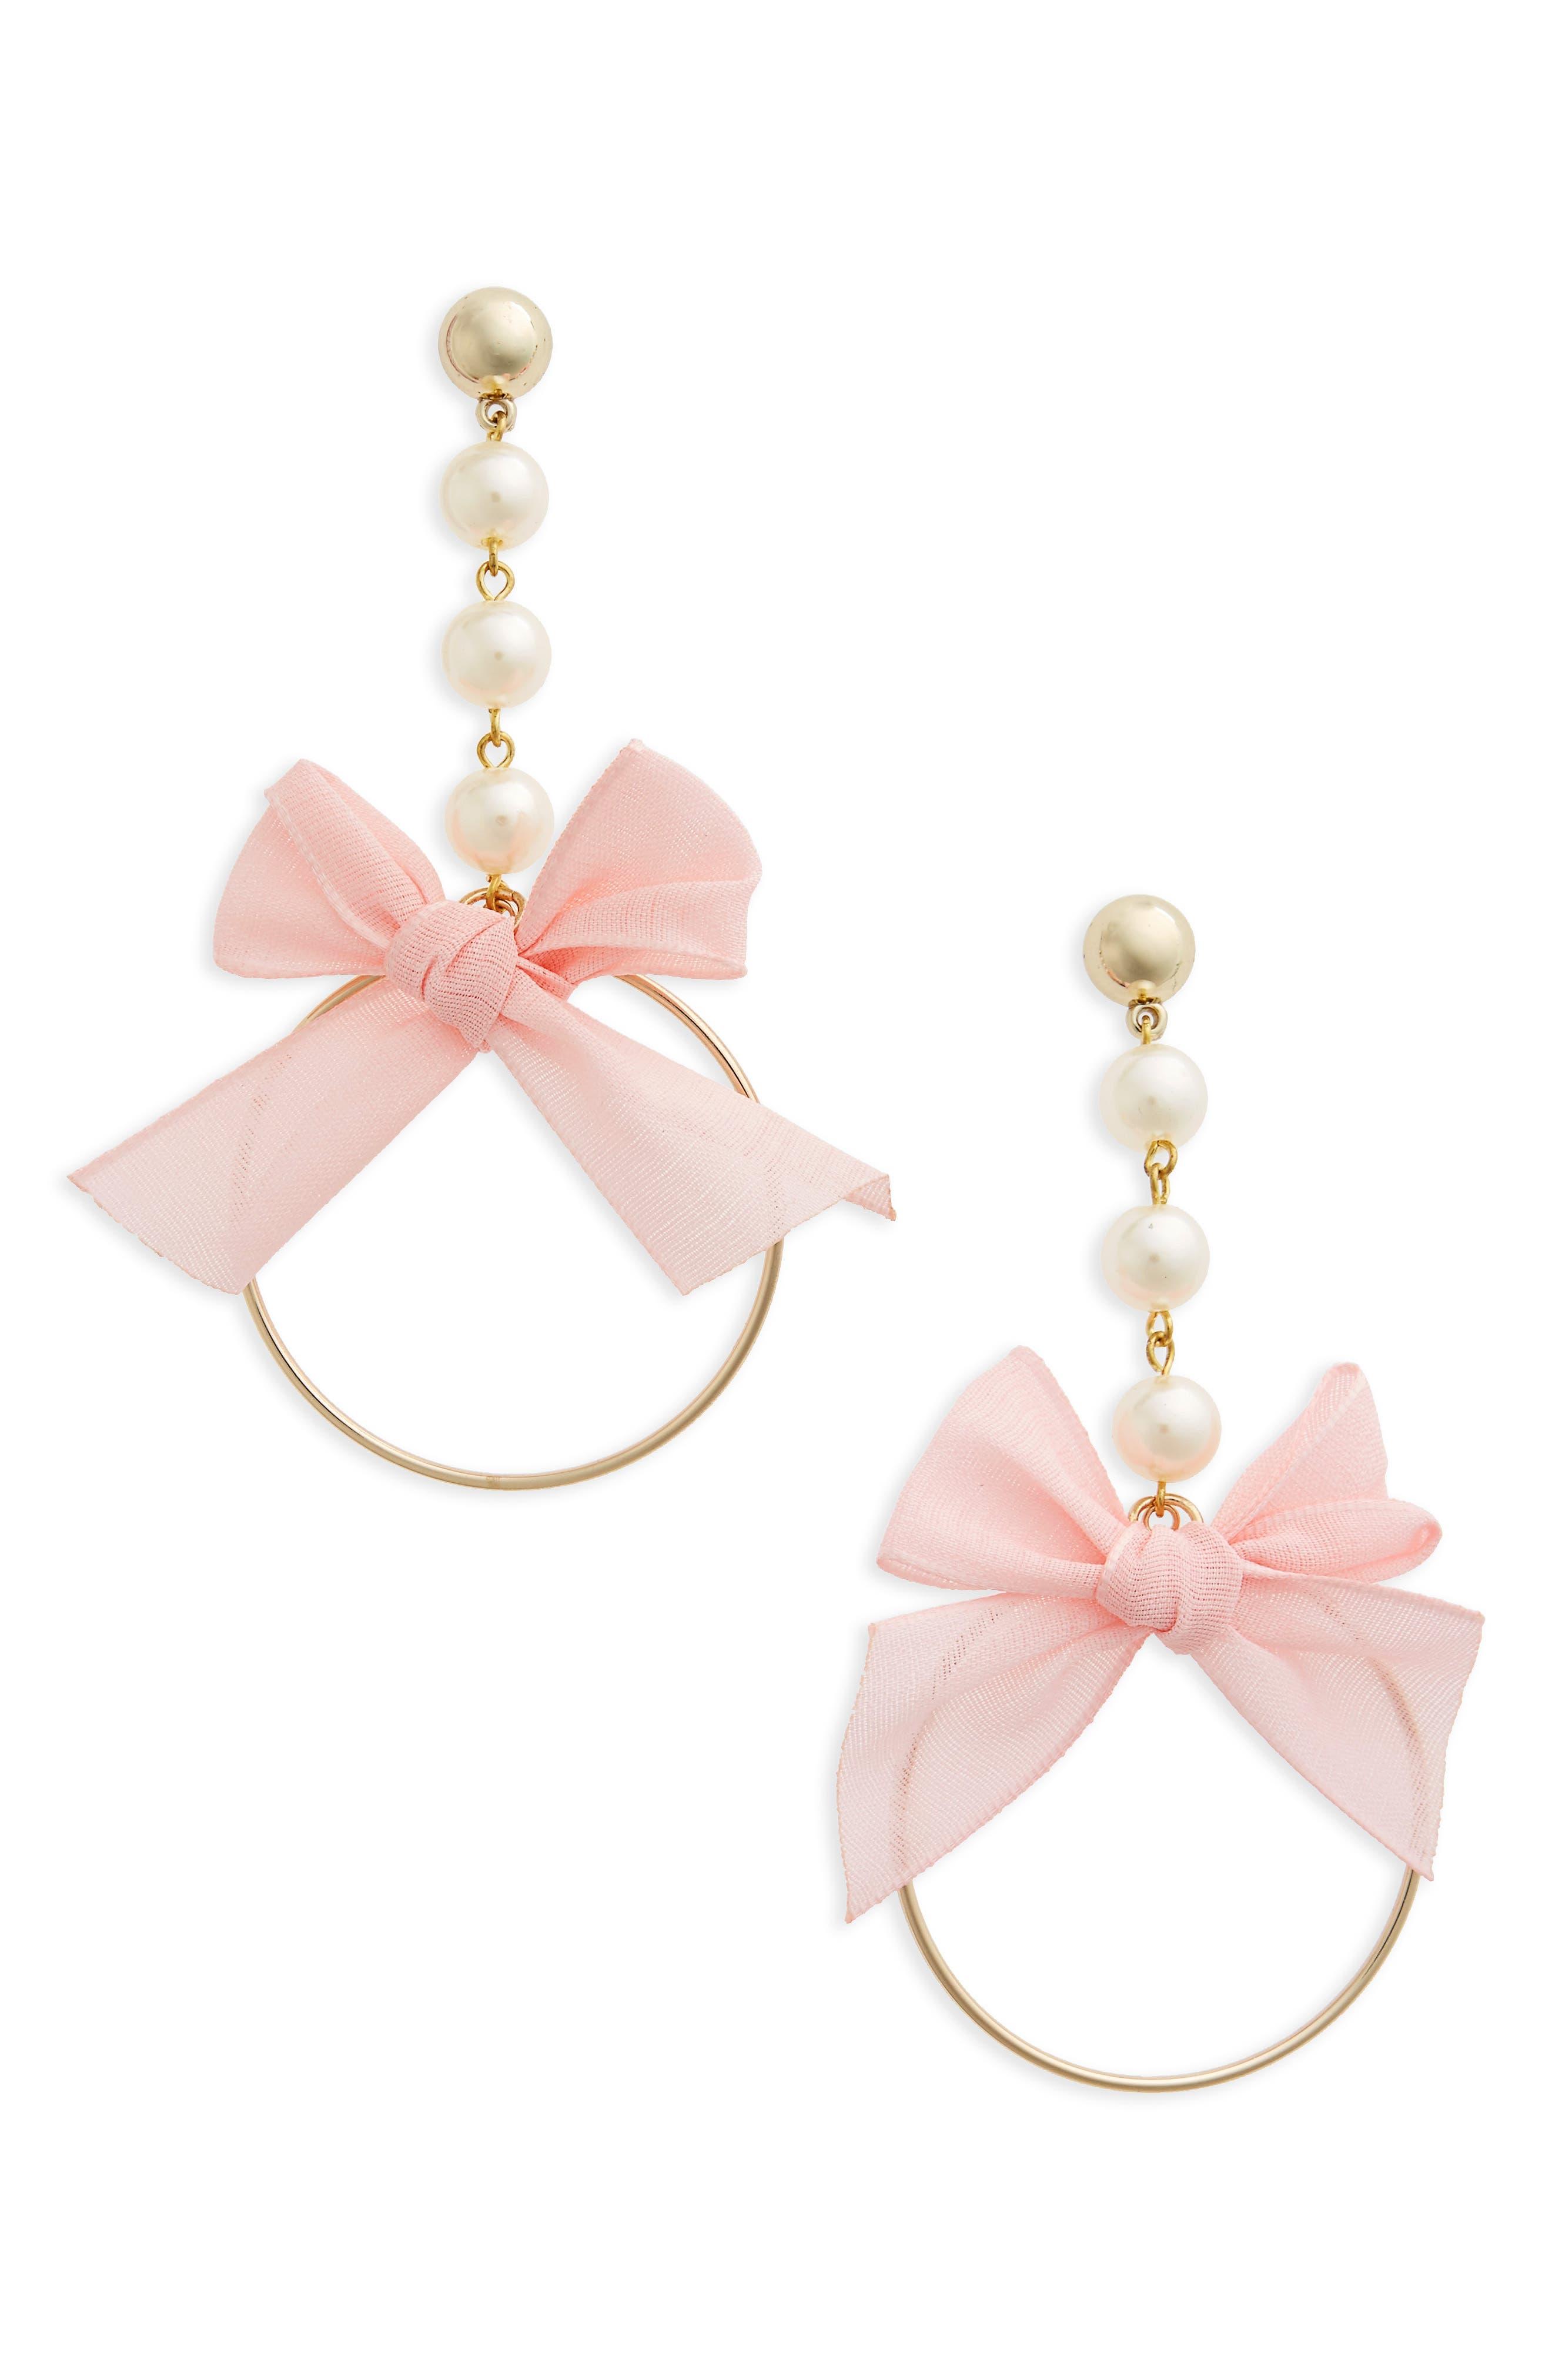 Bow Drop Earrings,                             Main thumbnail 1, color,                             Gold